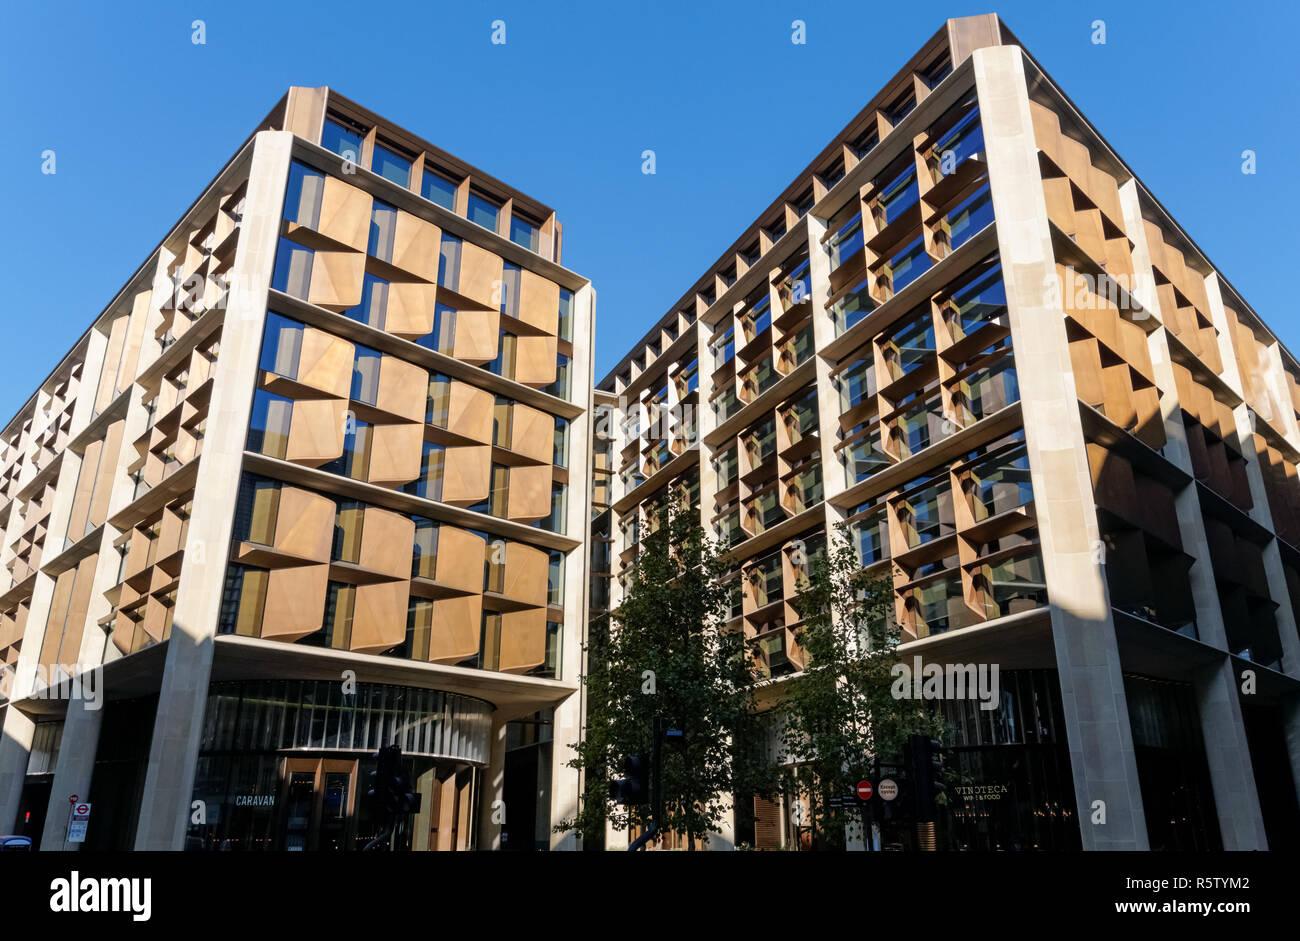 Bloomberg European Headquarters in London, England United Kingdom UK - Stock Image